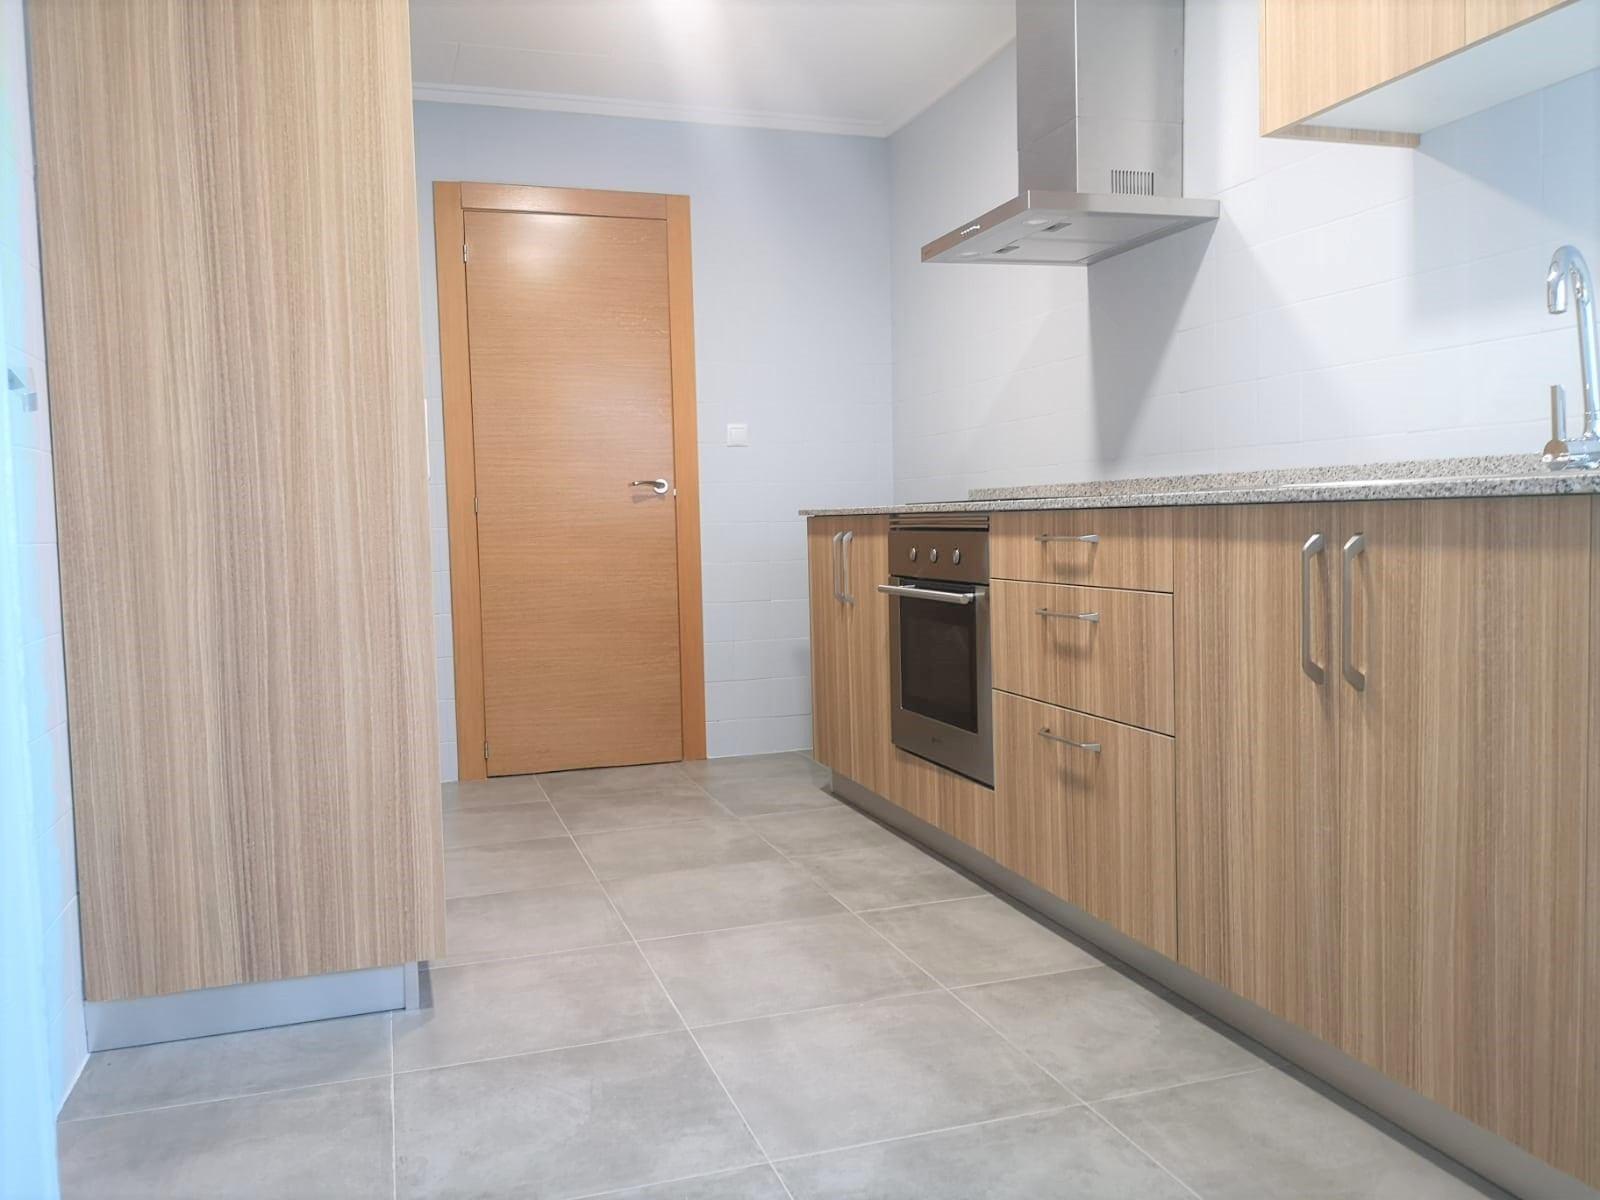 IMG 20200303 WA0020 - Inmobiliaria Selkies - Alquiler Piso en Barcelona